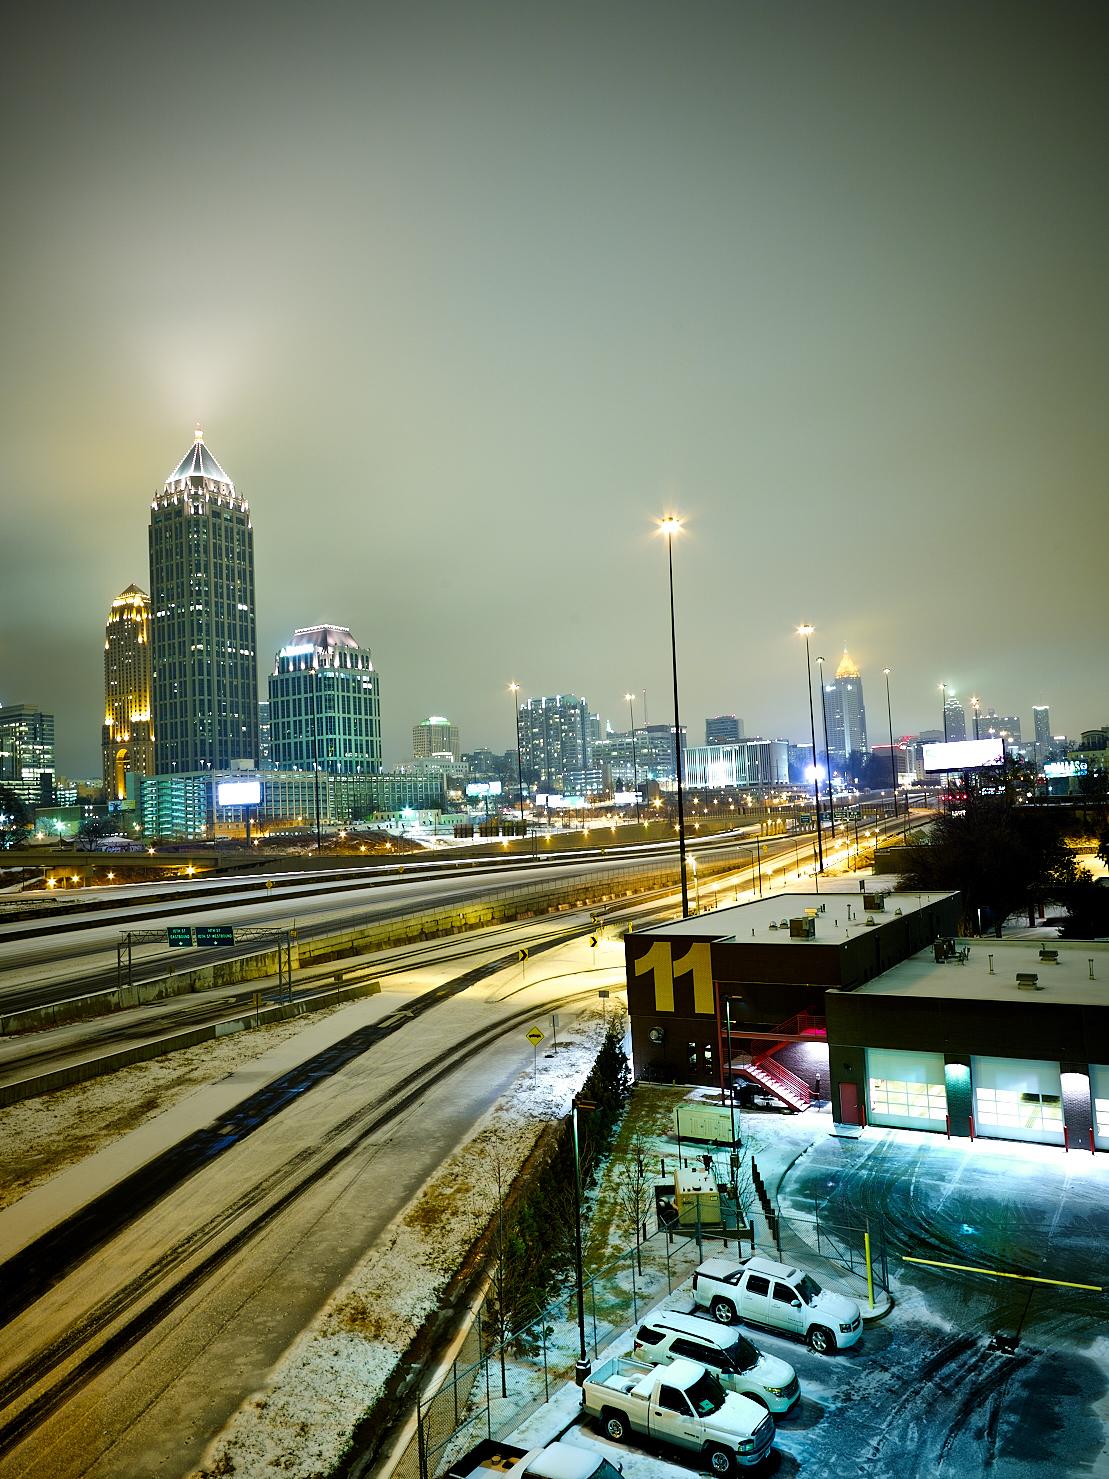 Snowpocalypse Atlanta - 2014